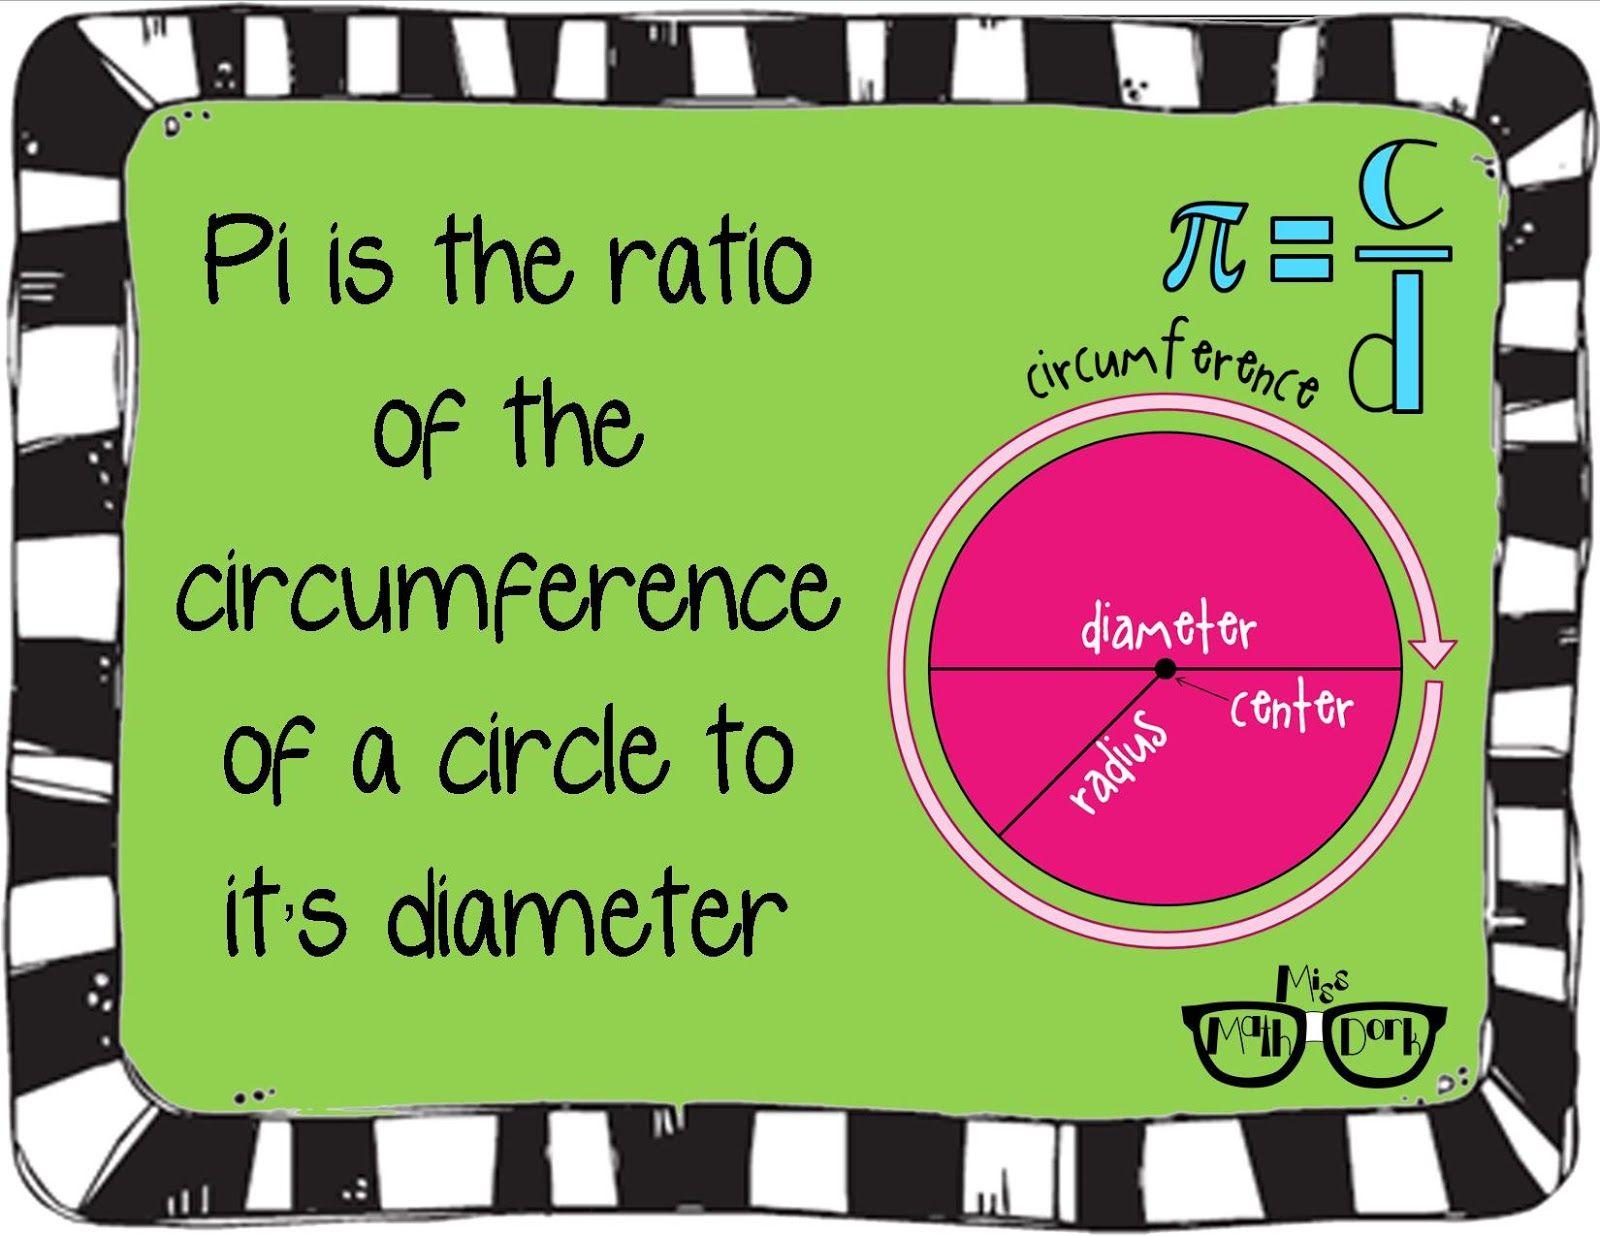 Missmathdork Middle School Math Made Fun Ta Da